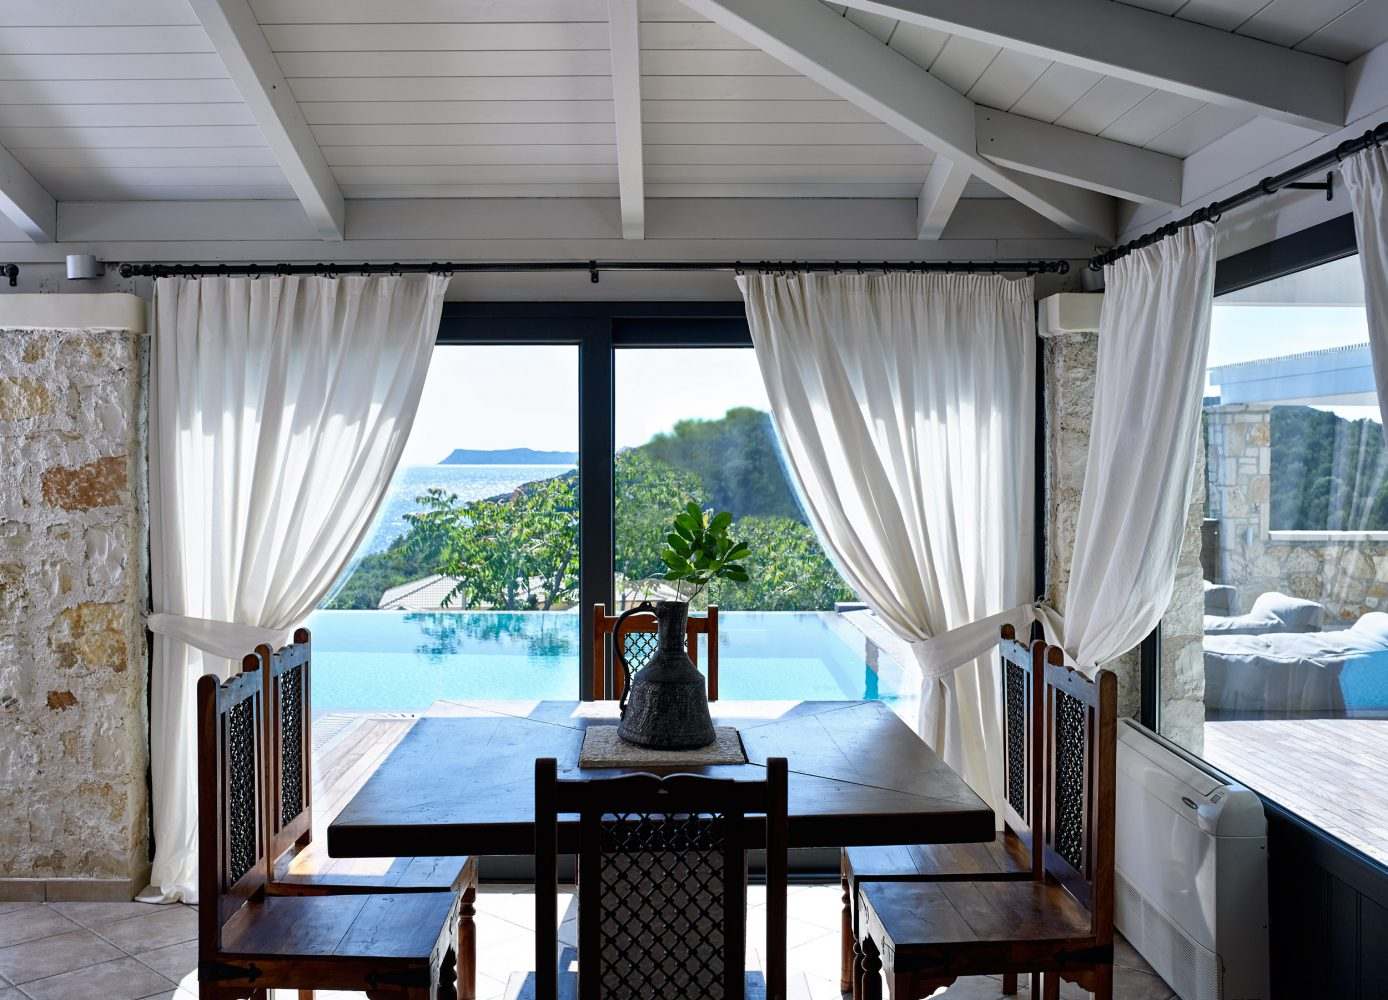 Island View A Gorgeous Luxury Villa In Greece To Sleep